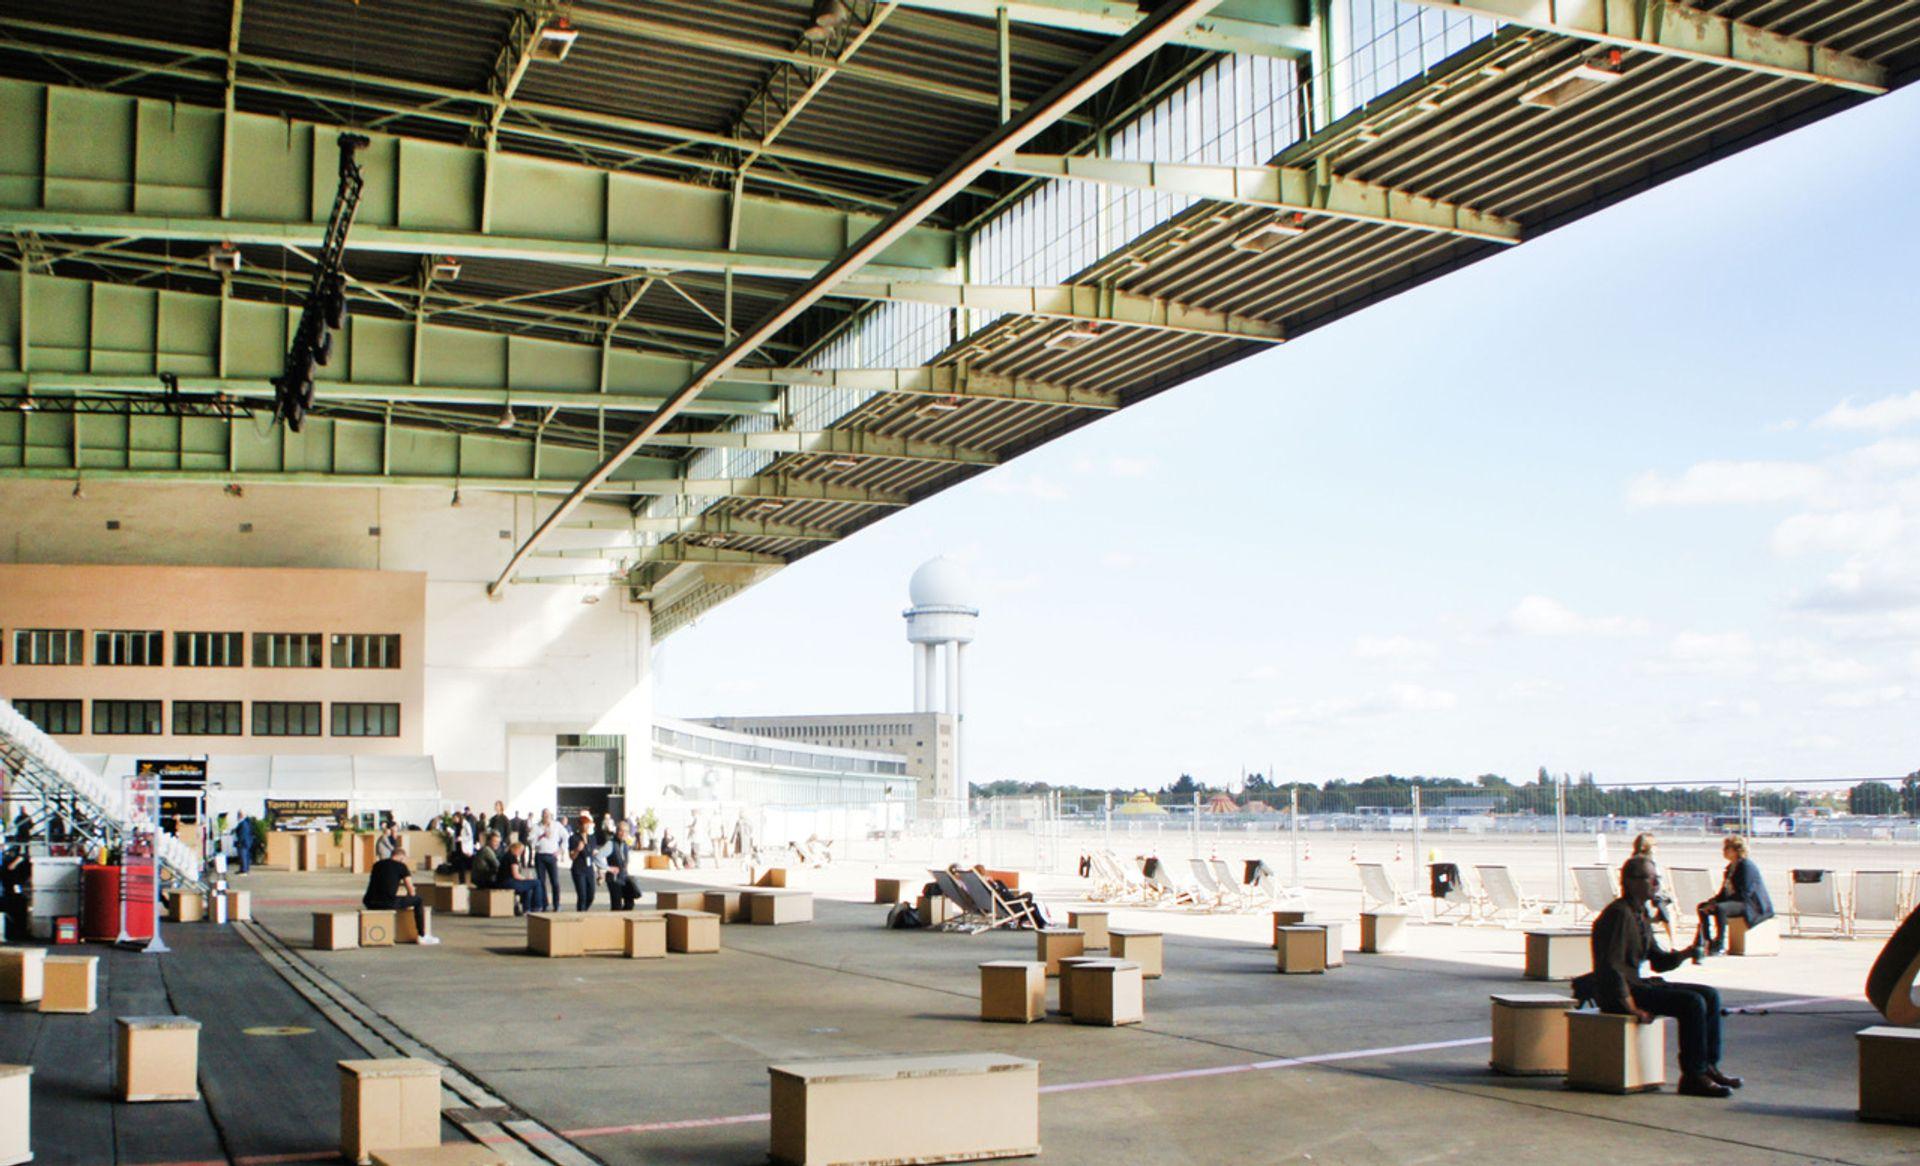 Positions Berlin Art Fair will feature more than 130 exhibitors at Tempelhof Airport Hangar 3-4 © Positions Berlin Art Fair